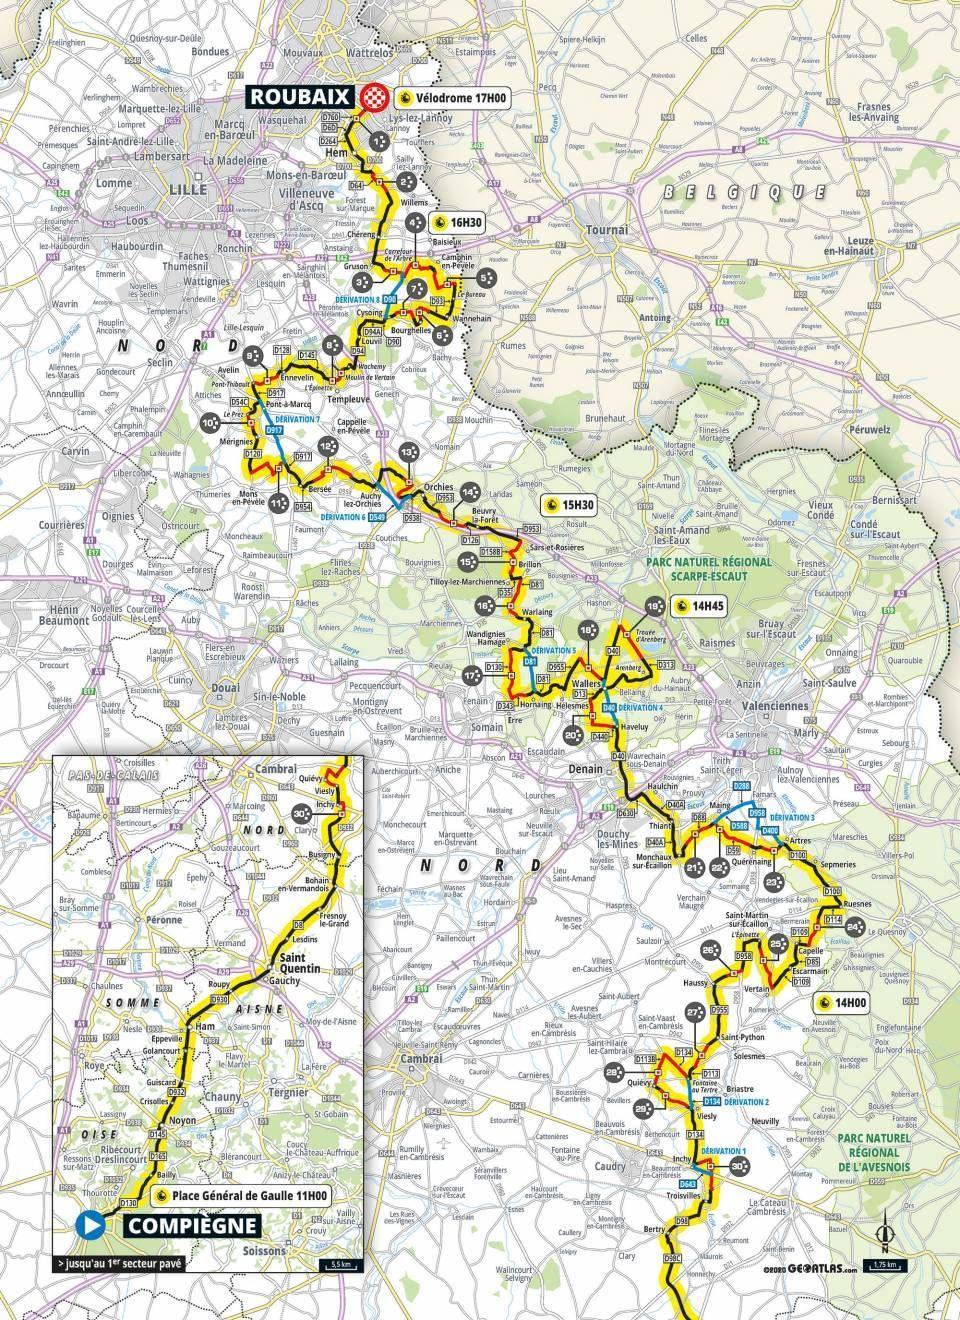 Karte Paris-Roubaix 2021 |  Radsportnews